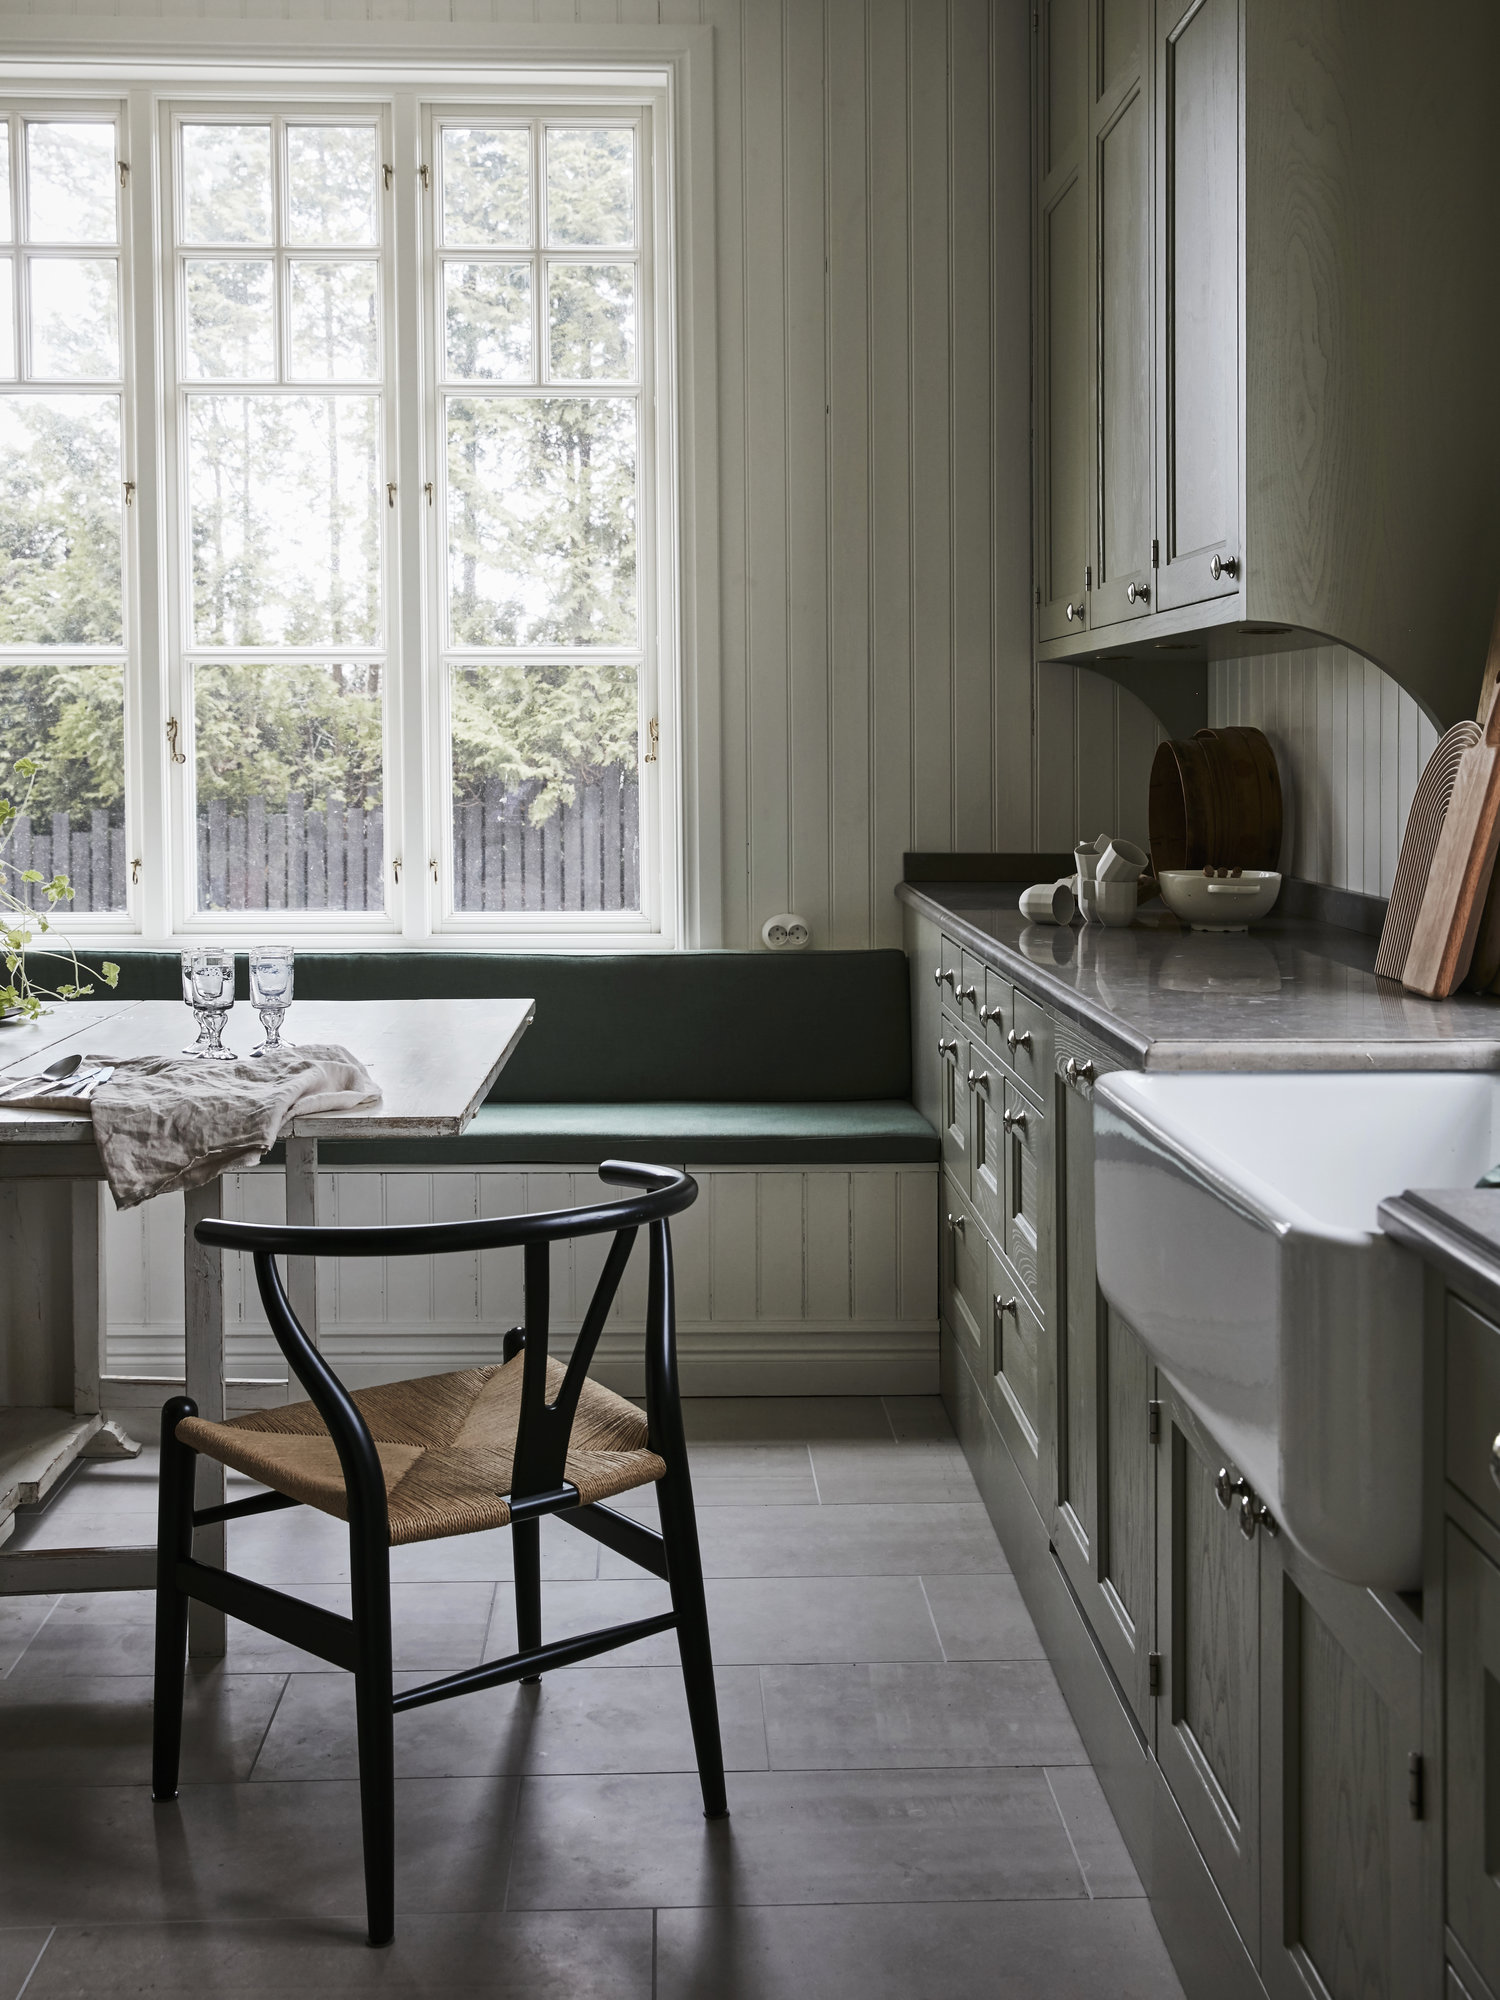 Interiors, Kitchen